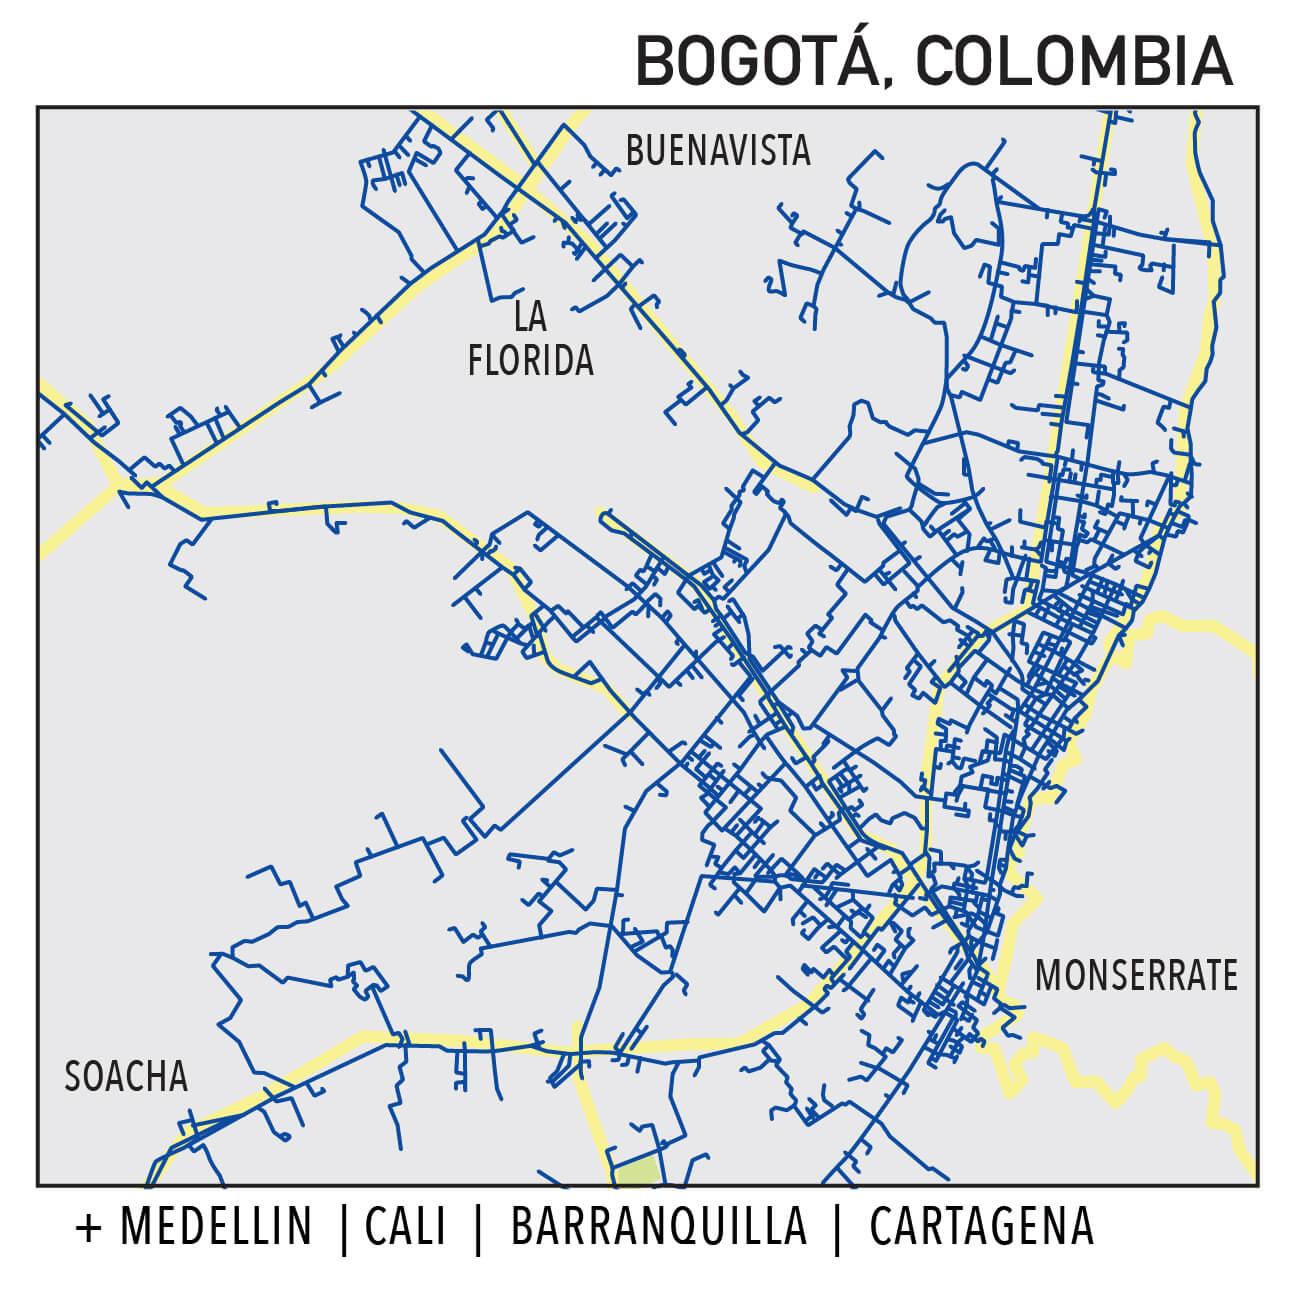 South America bolsters Ufinet's fiber deployments